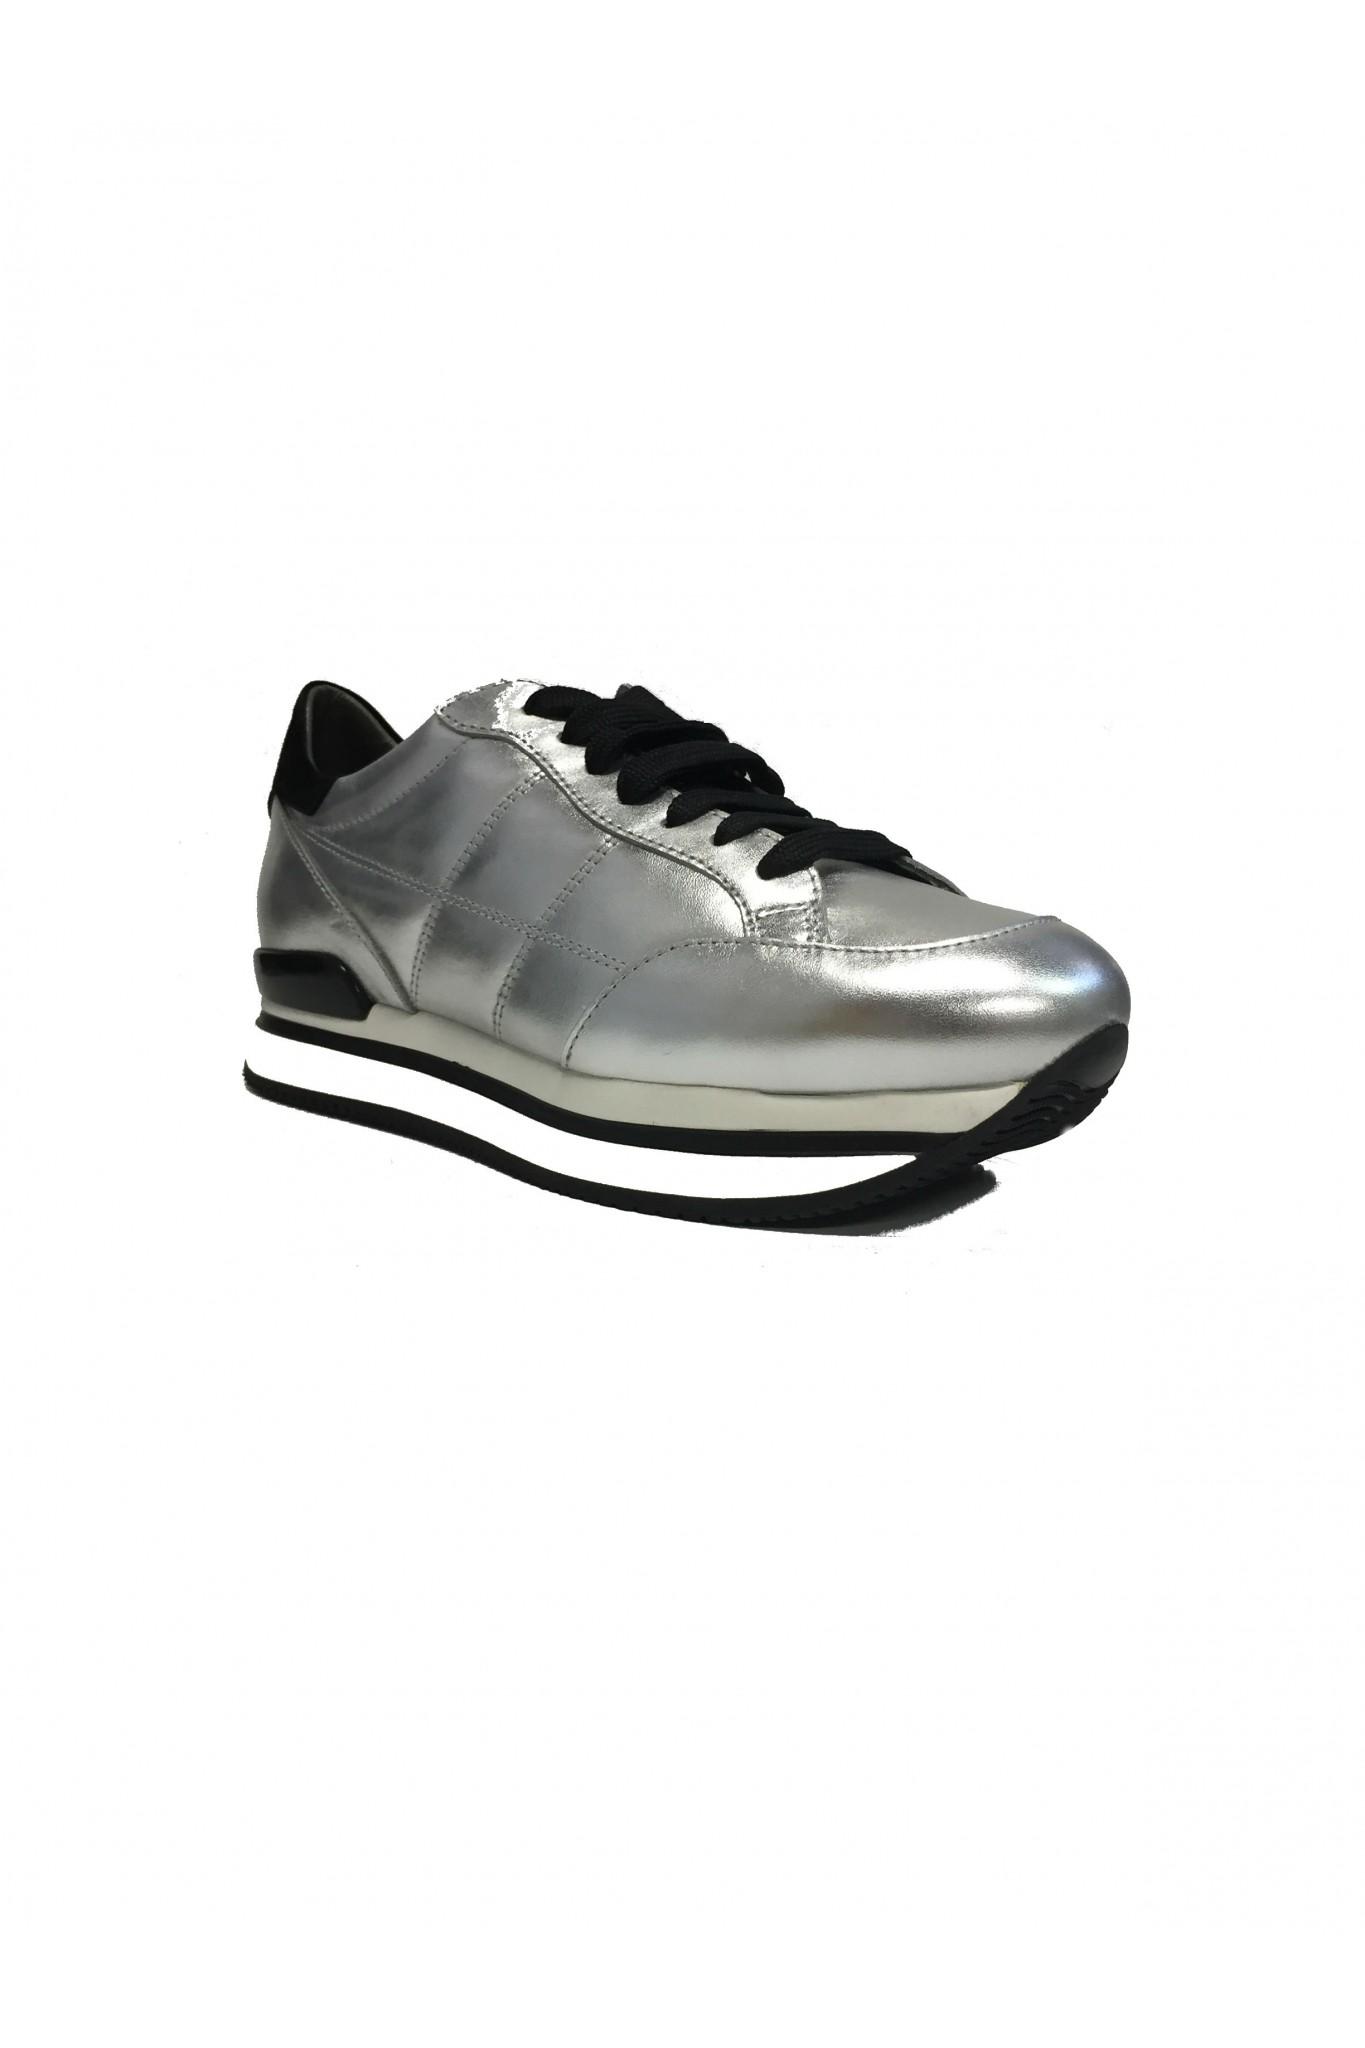 hogan h222 argento